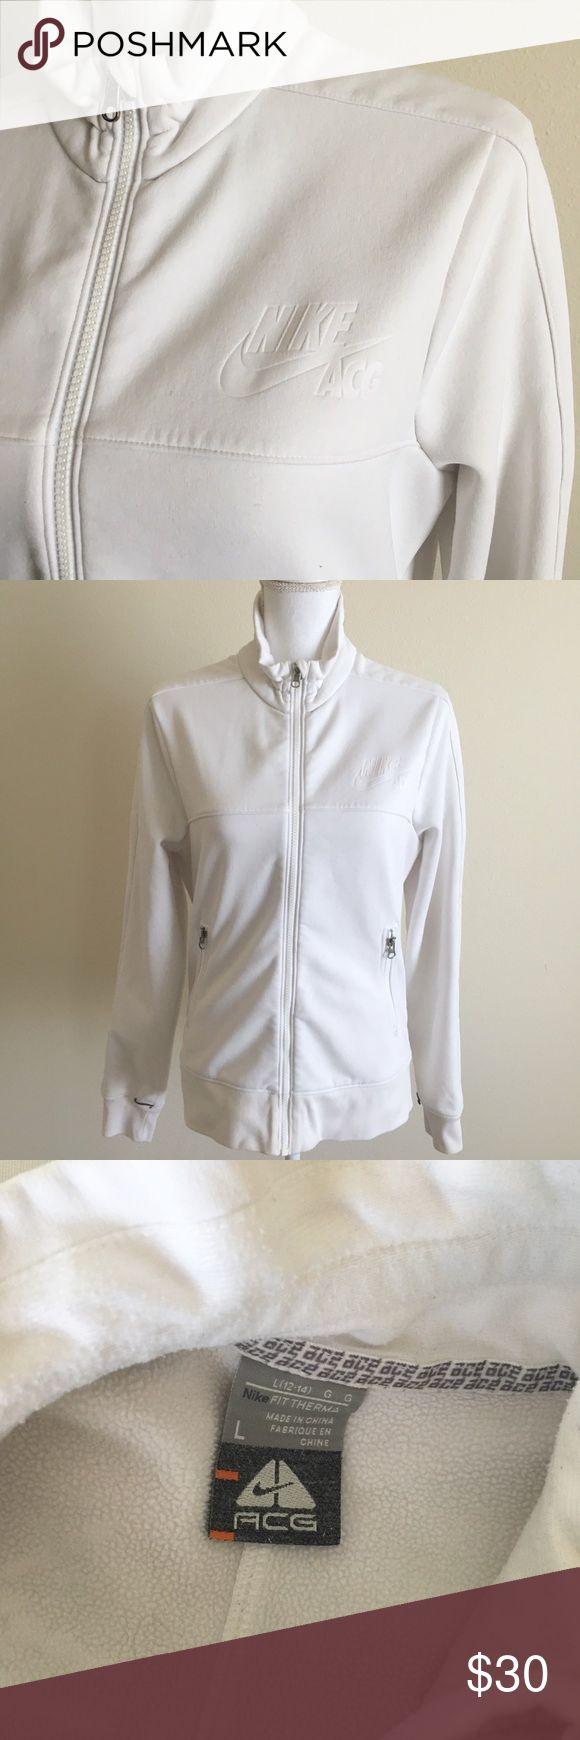 Nike Jacket ✨ Nike ACG zip up thick sweater/ light jacket - Hooded - Soft fleece lining - Women's Large ✨ Nike Sweaters